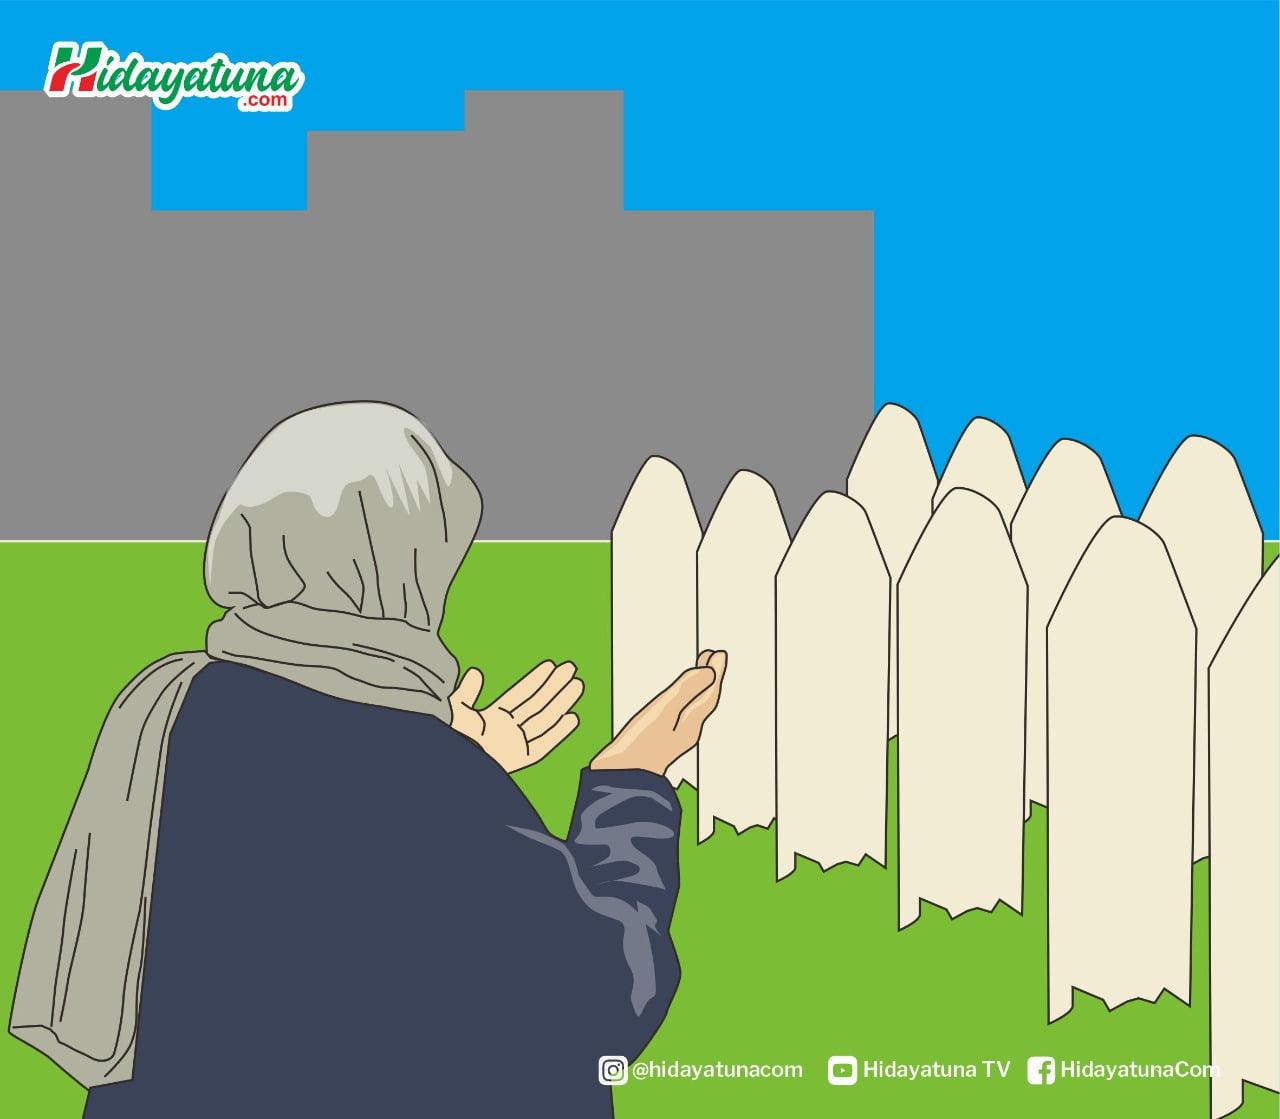 Doa Rasulullah saat di makam (Ilustrasi/Hidayatuna)